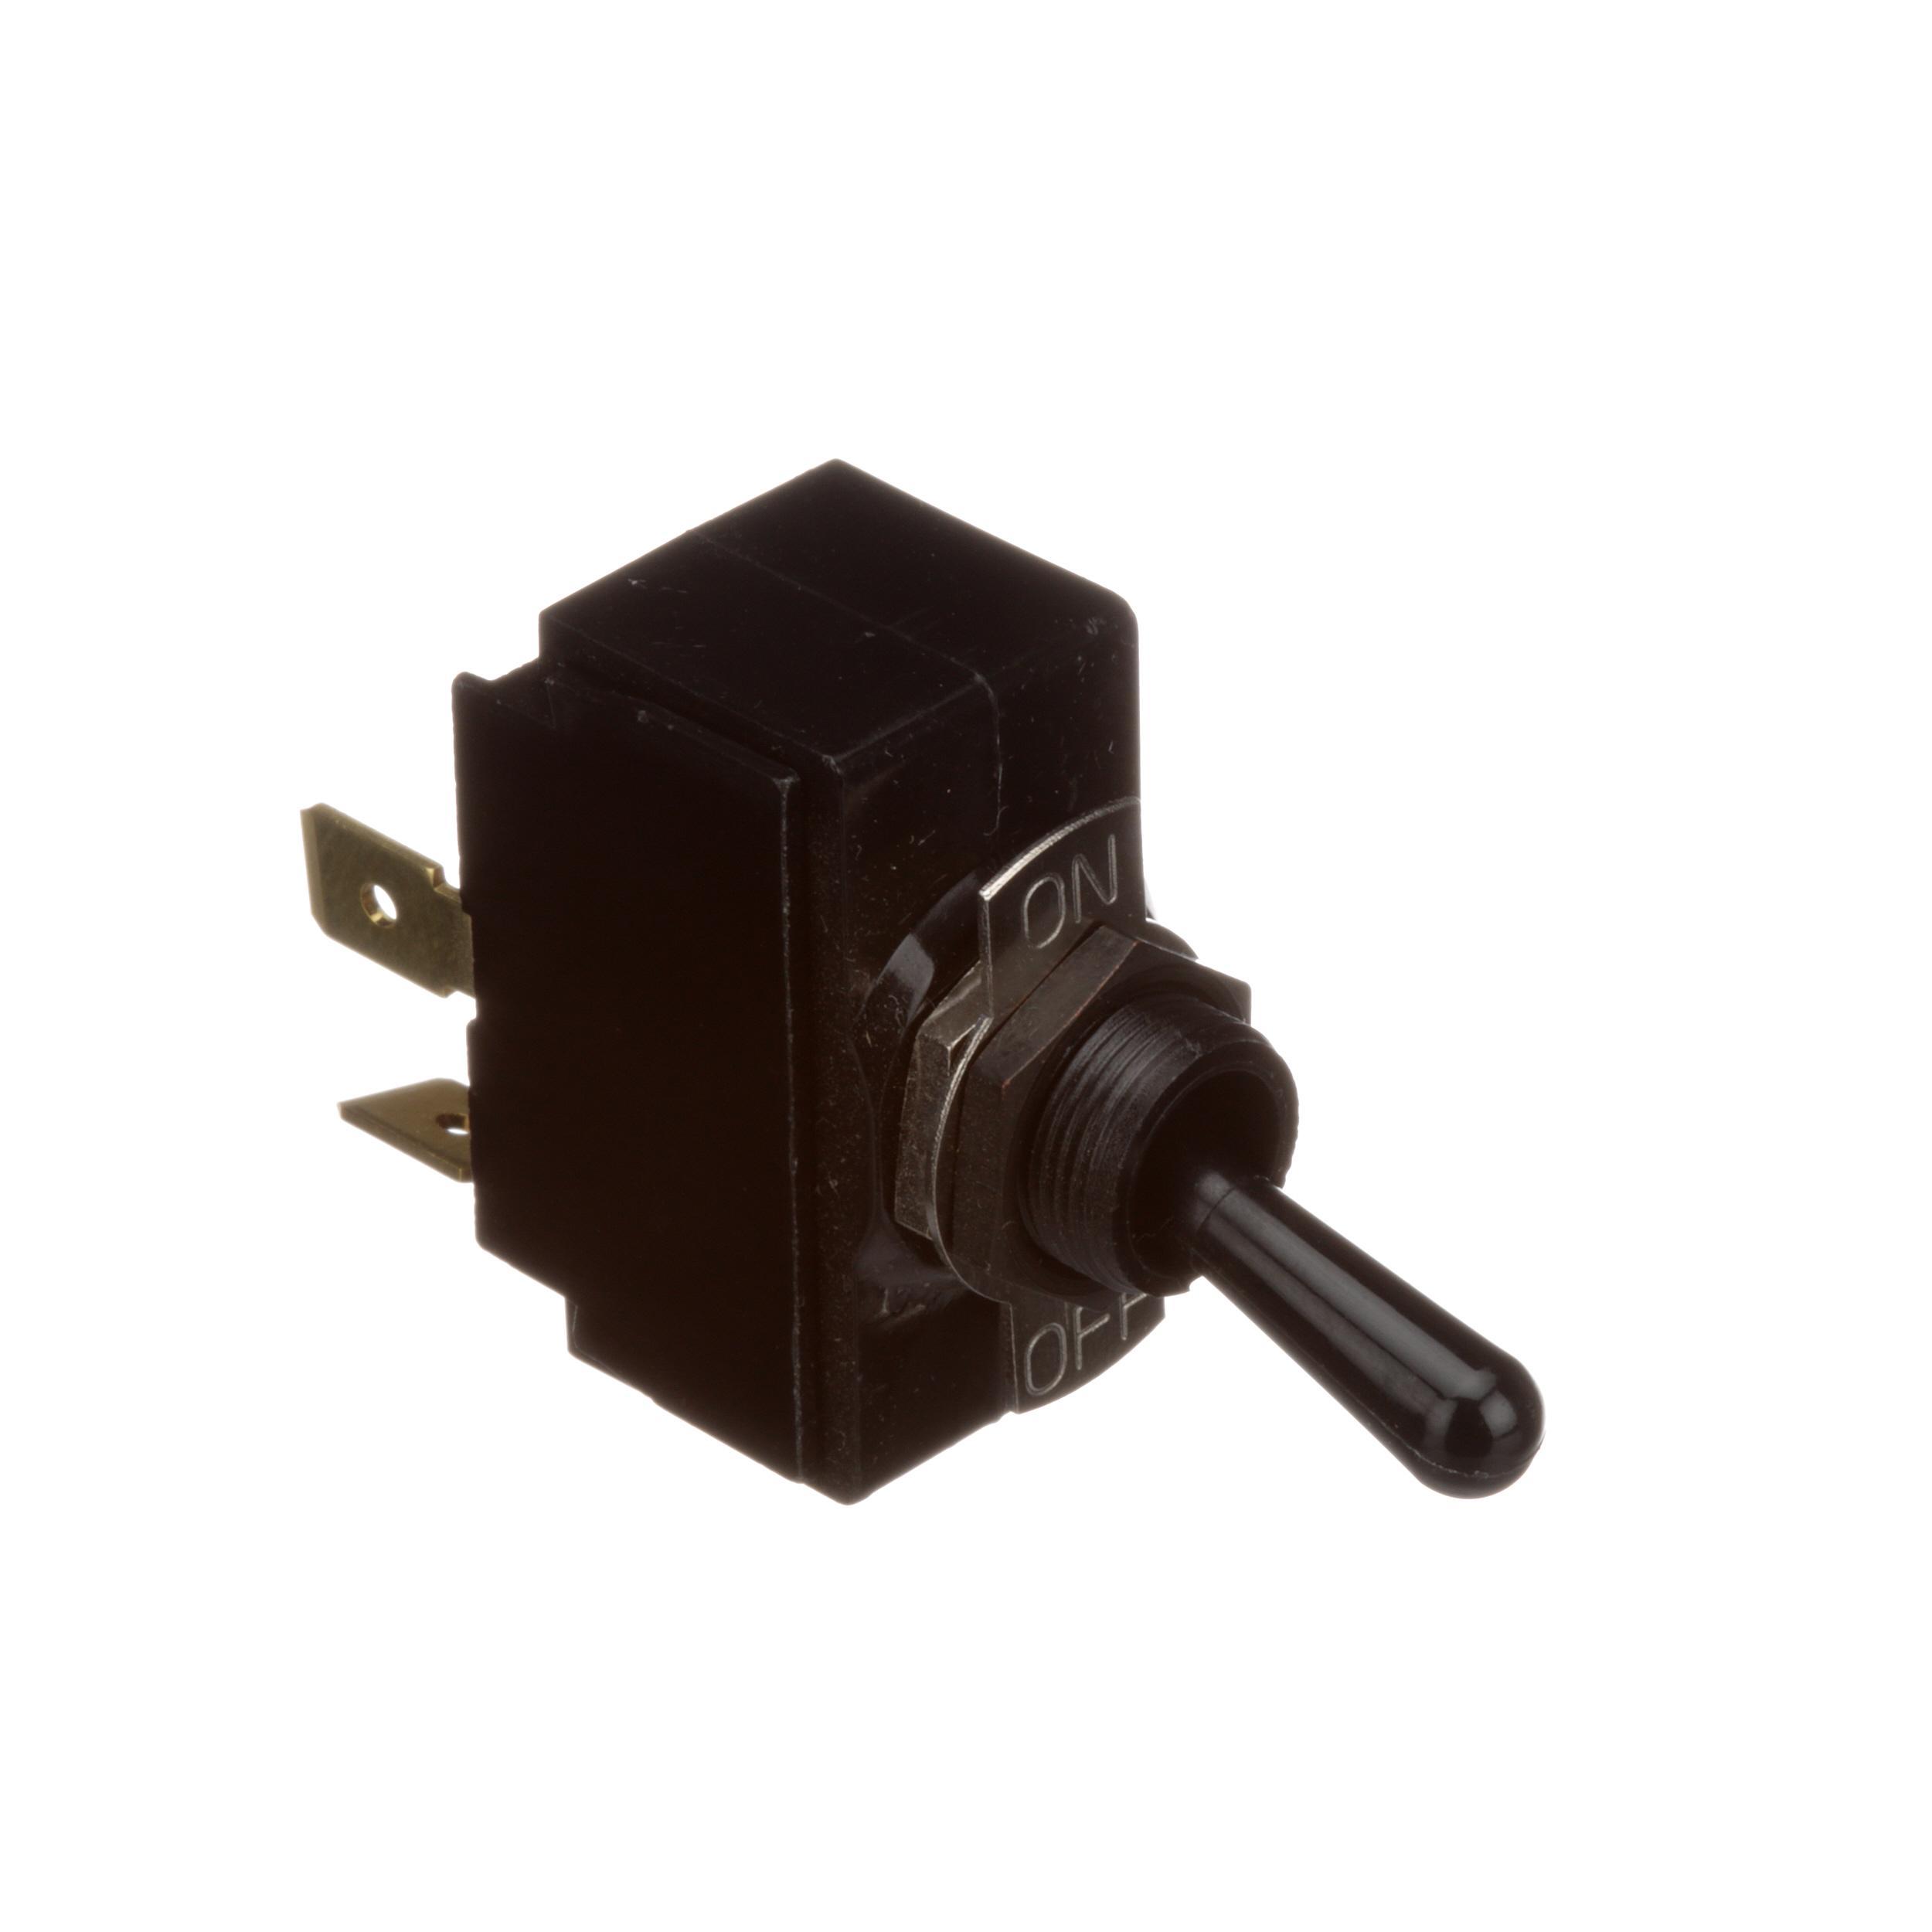 cres cor toggle switch part 0808 020. Black Bedroom Furniture Sets. Home Design Ideas